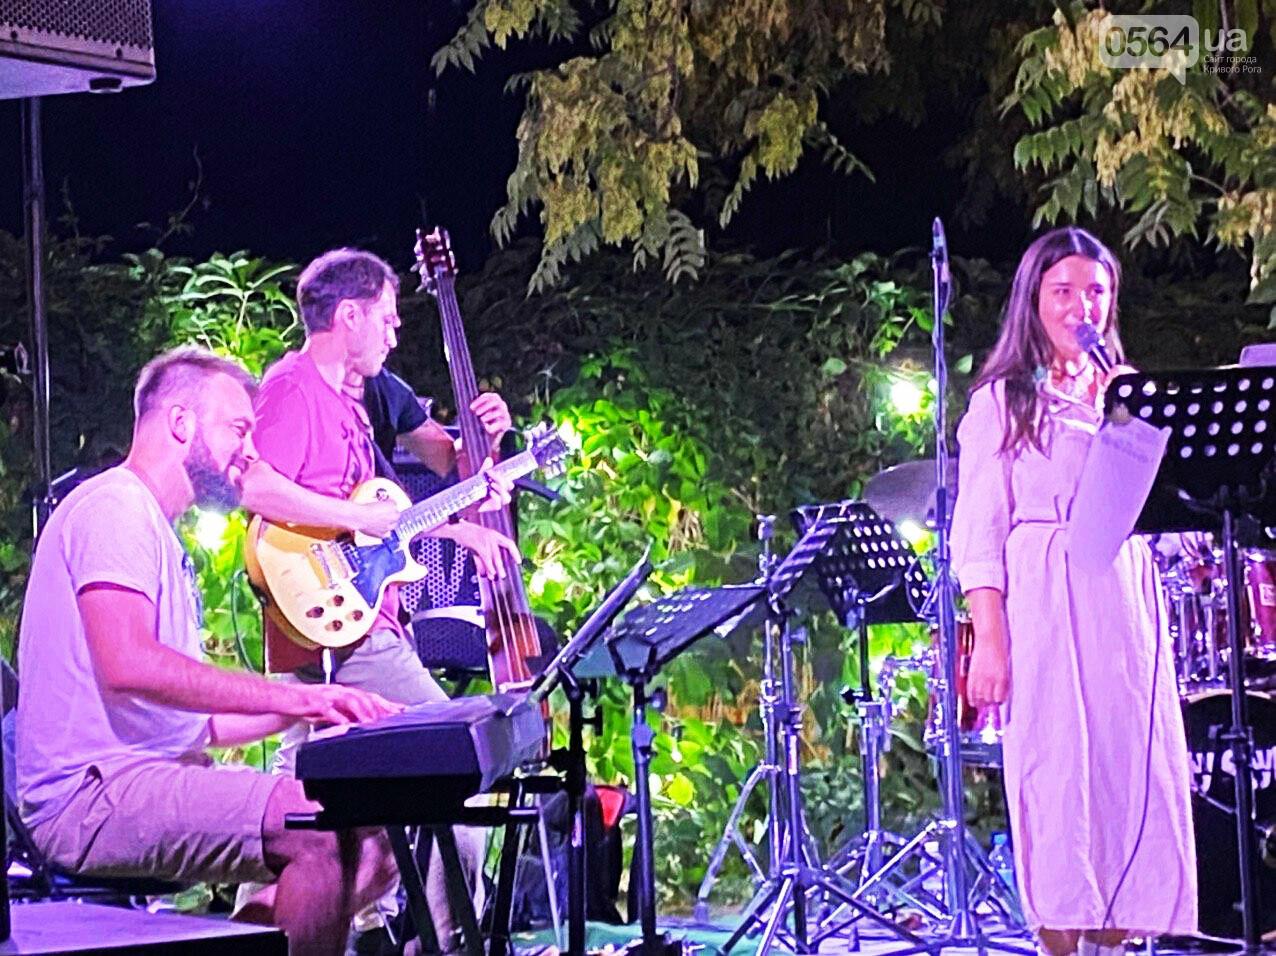 Под звездным небом криворожане наслаждались летним джазом от  Advantage Project, - ФОТО, ВИДЕО , фото-71